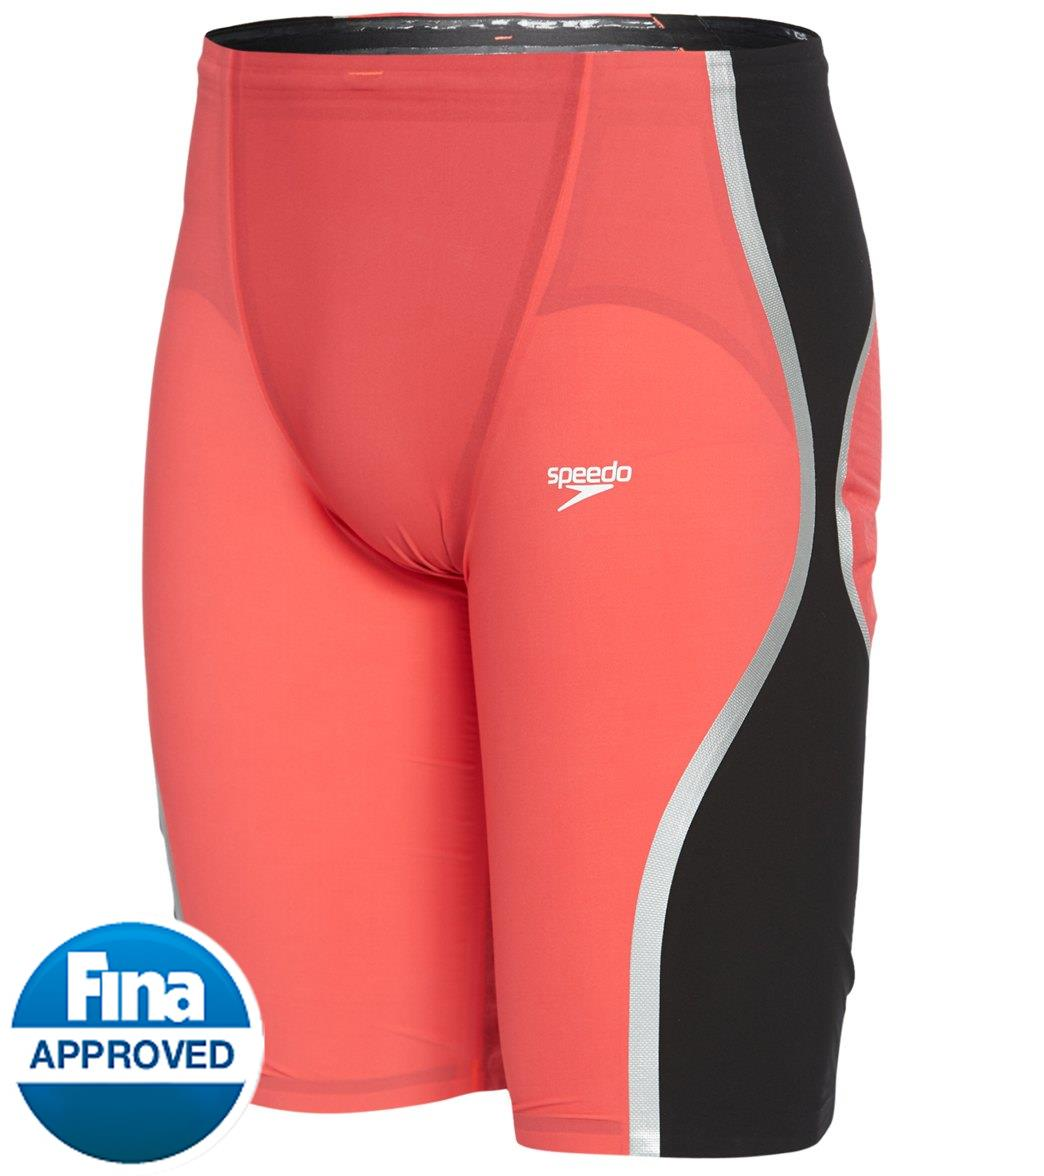 59ec7143c018b Speedo Men's LZR Pure Intent High Waist Jammer Tech Suit Swimsuit at  SwimOutlet.com - Free Shipping